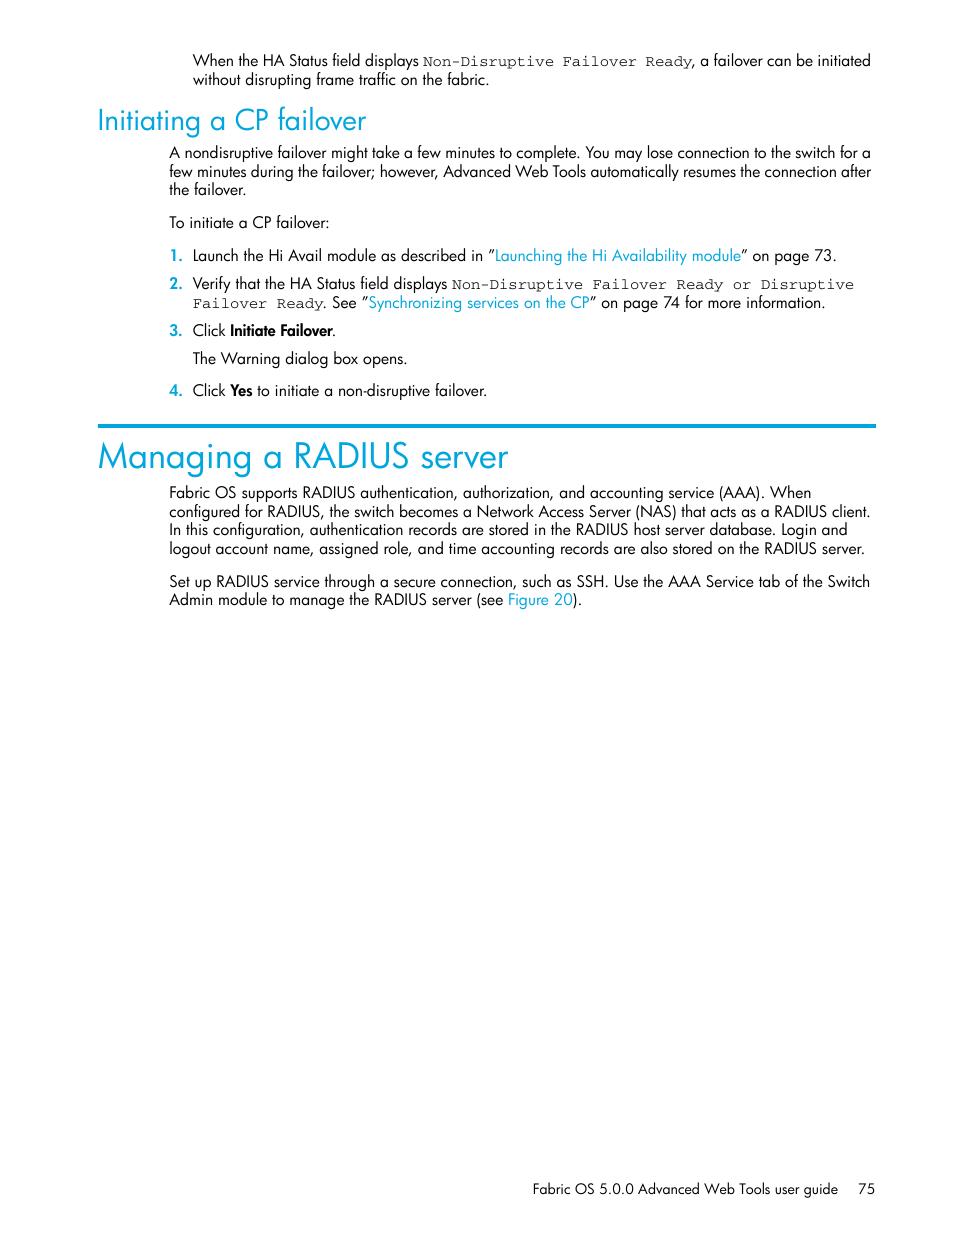 Initiating a cp failover, Managing a radius server   HP